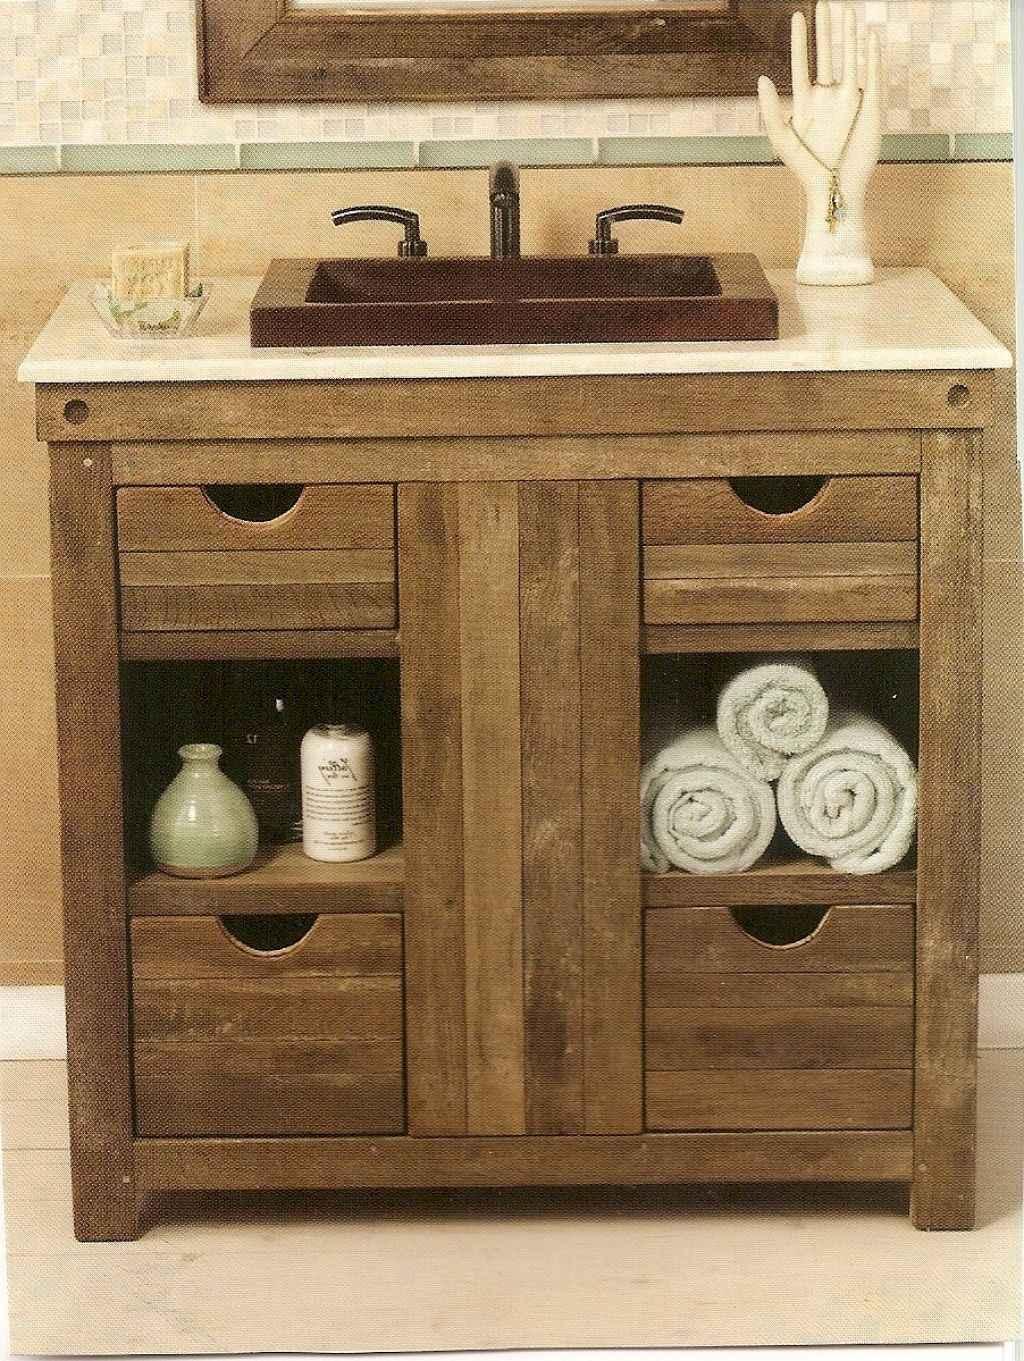 Inspiring rustic bathroom decor ideas (30)